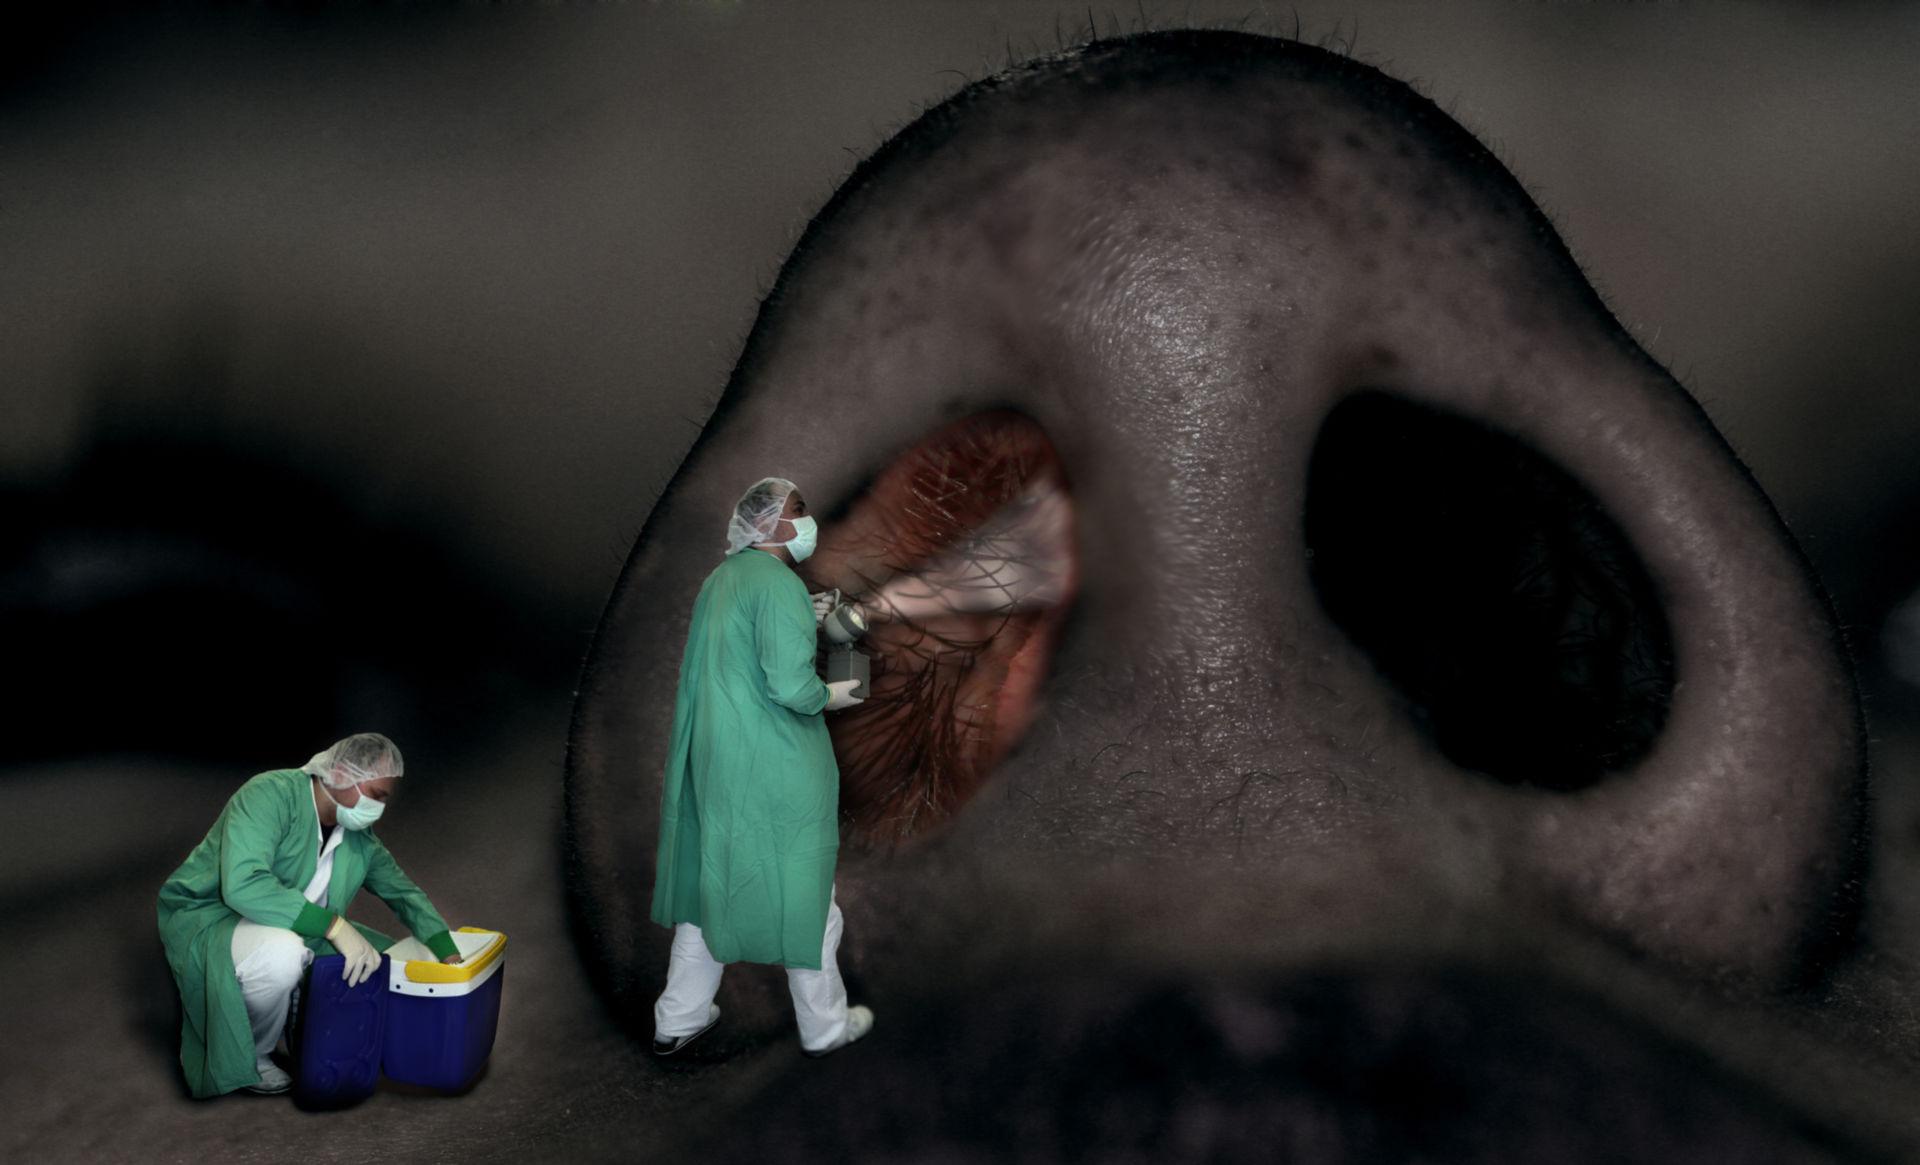 Germ inspector dark